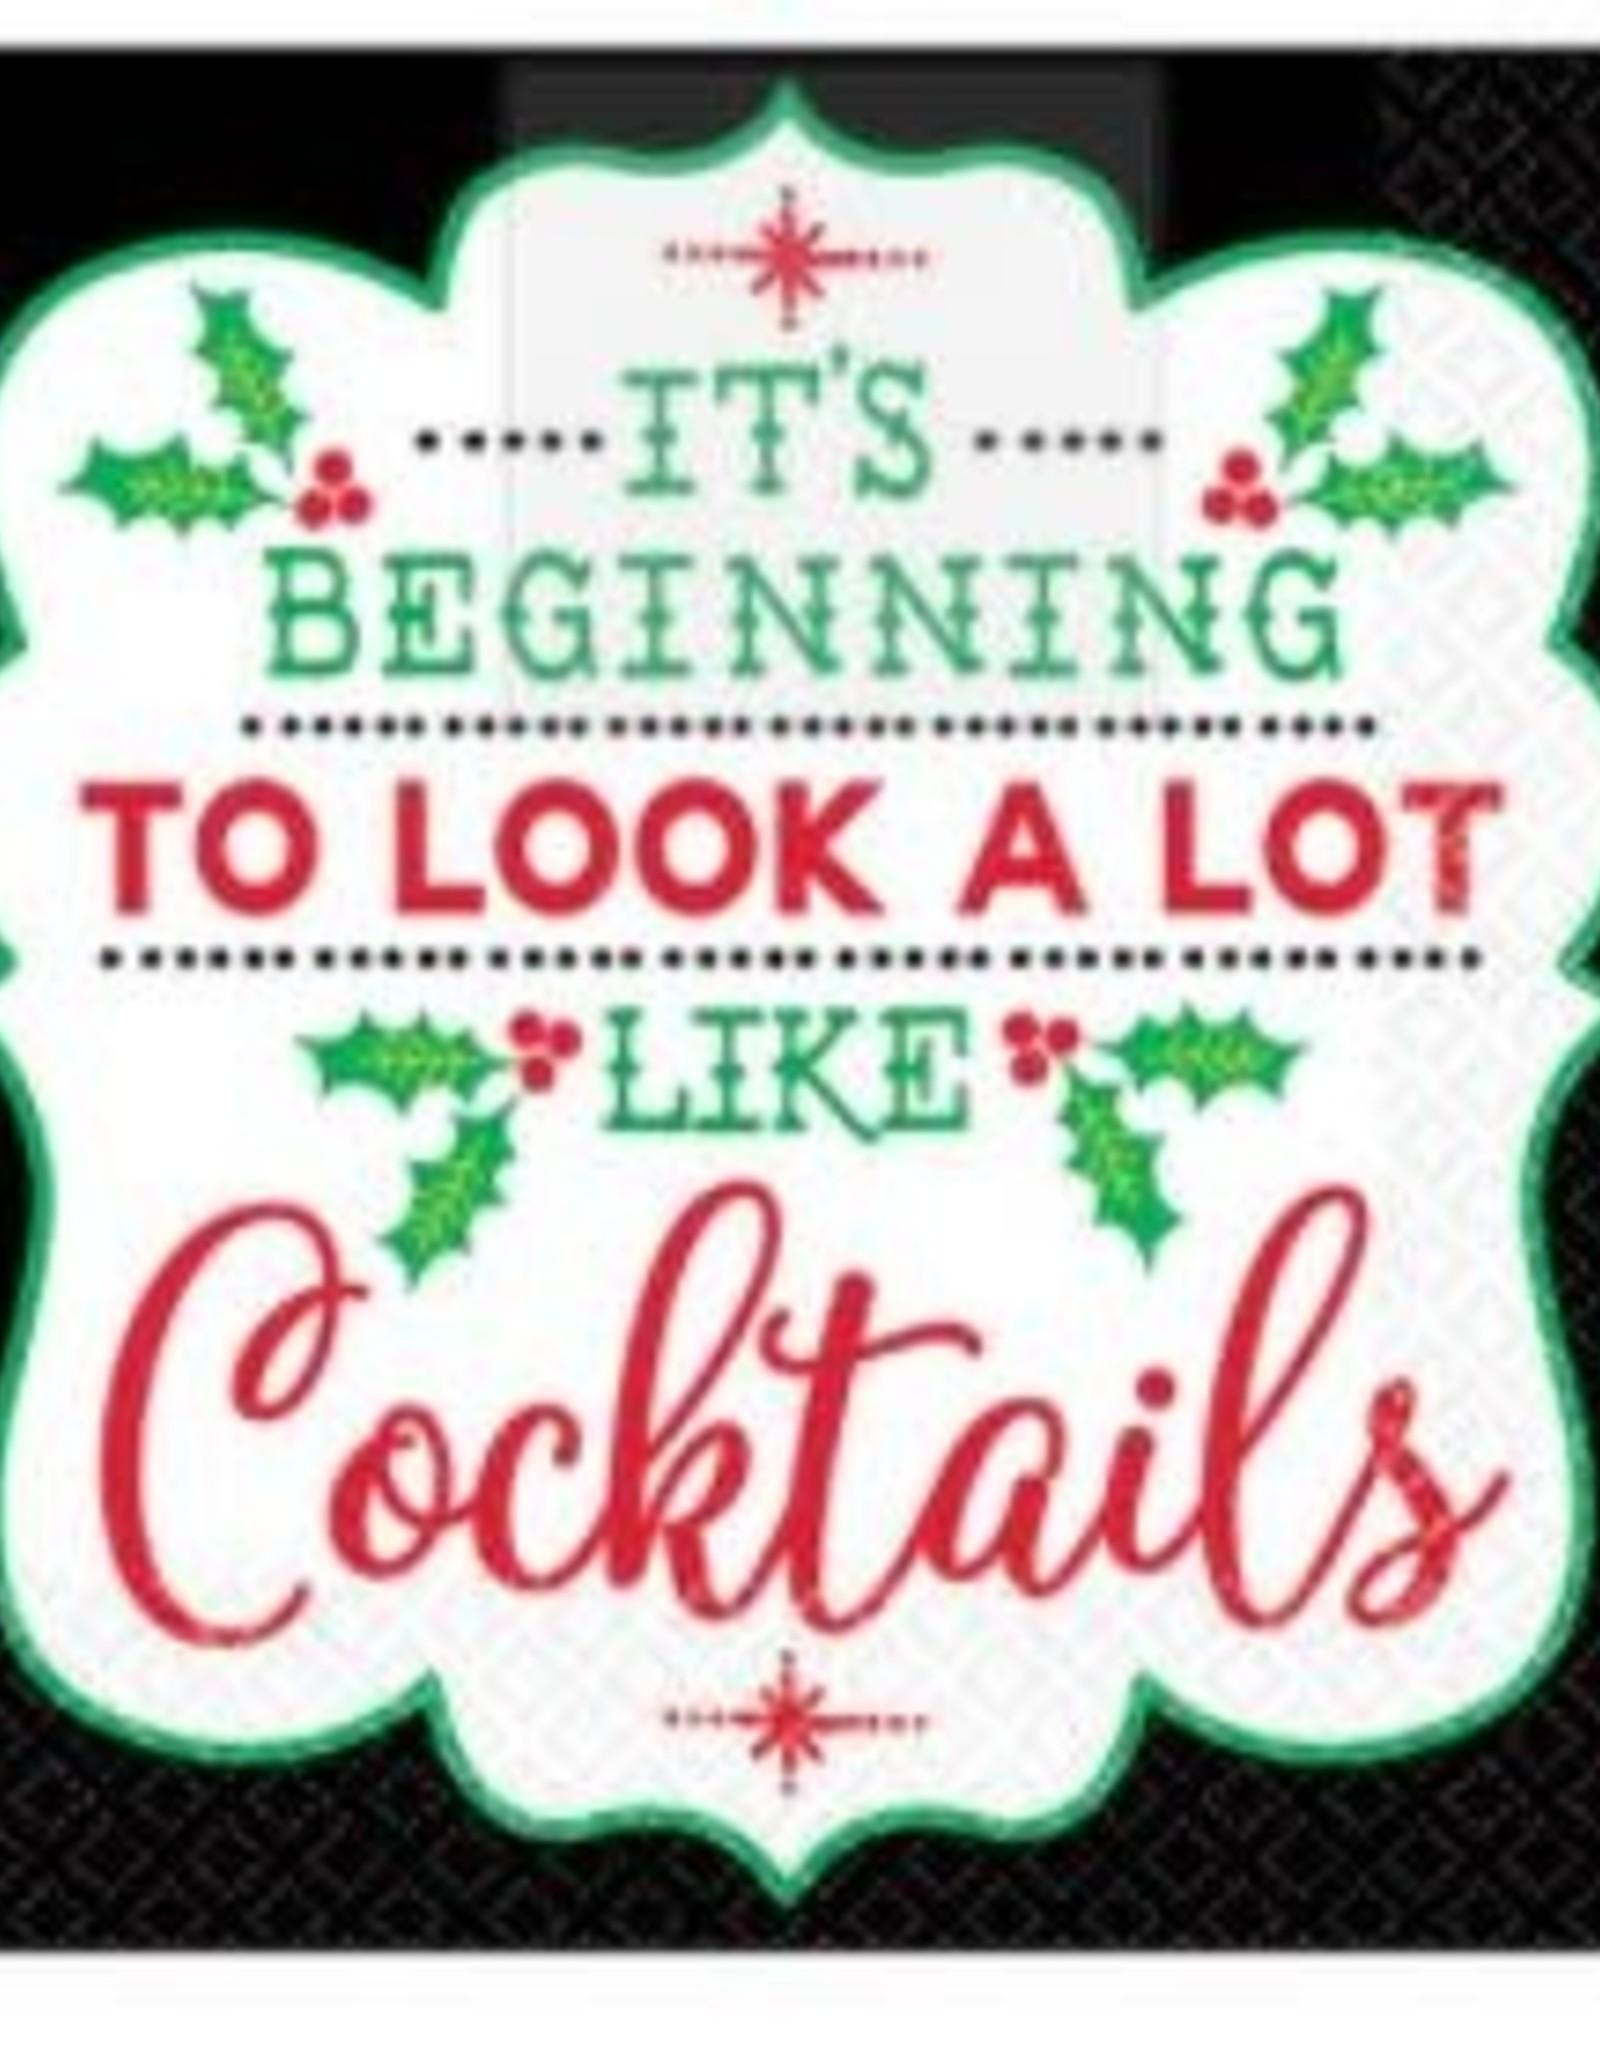 Christmas Cocktail Beverage Napkin